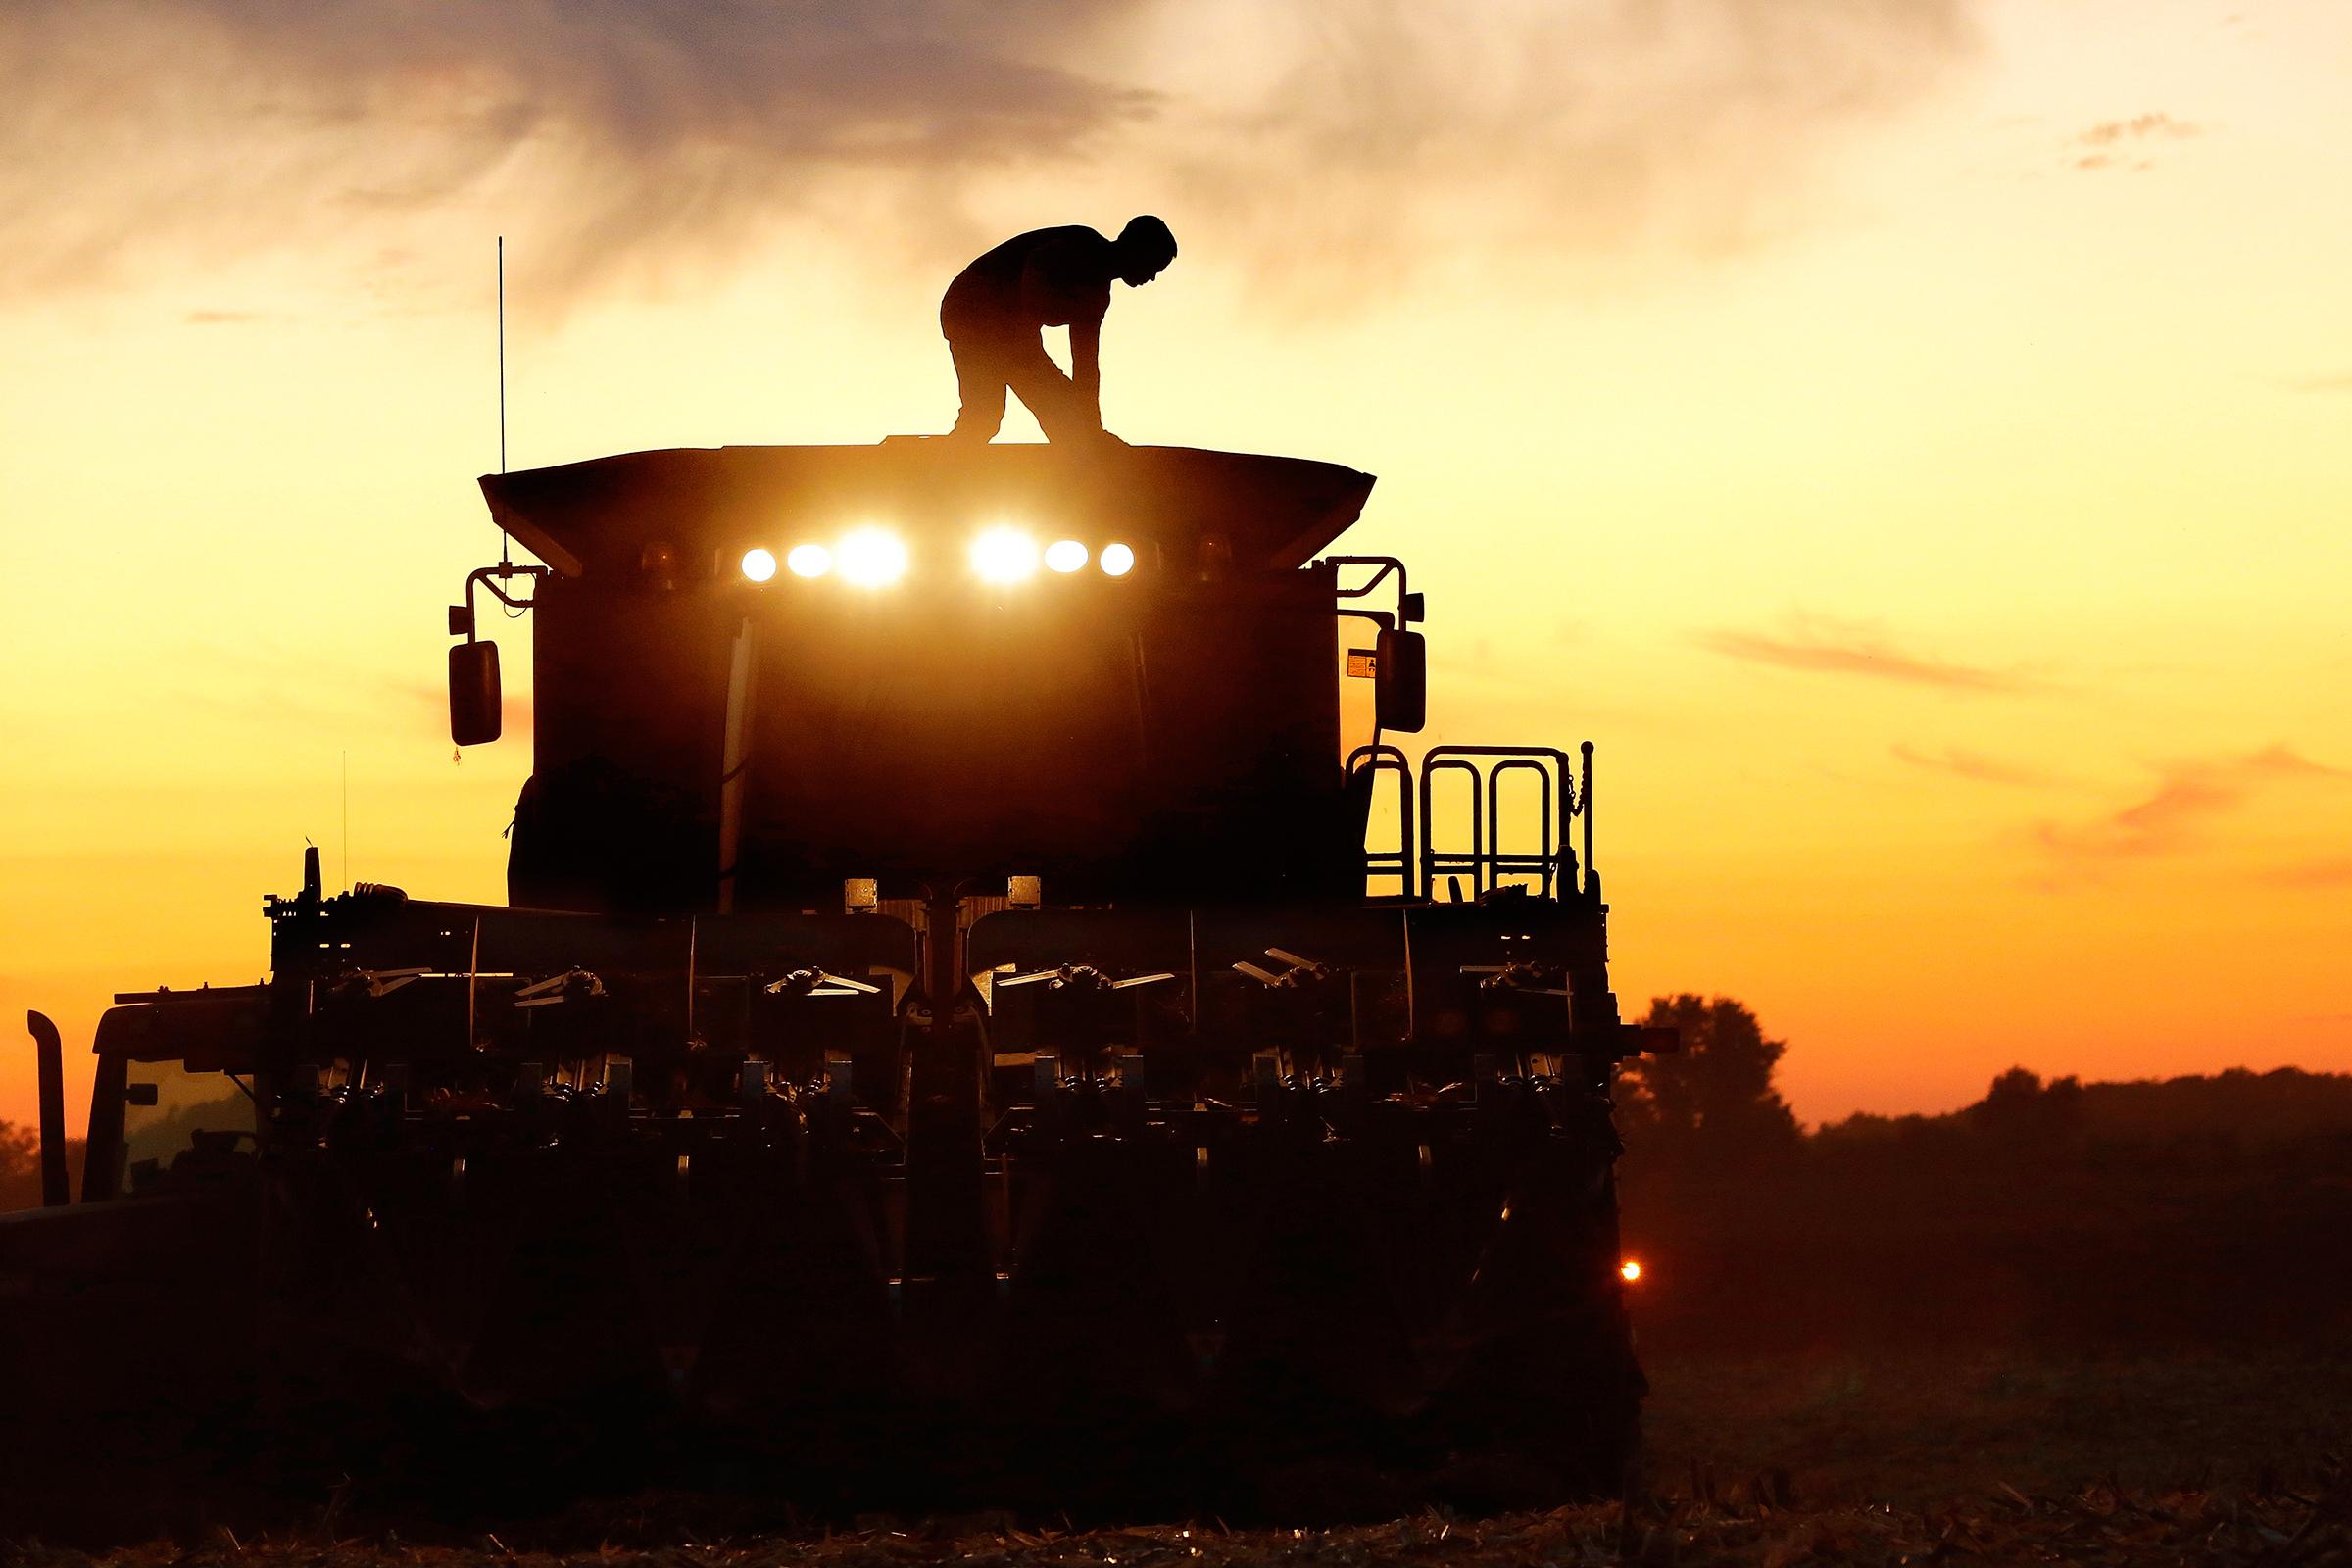 New High Tech Farm Equipment Is A Nightmare For Farmers